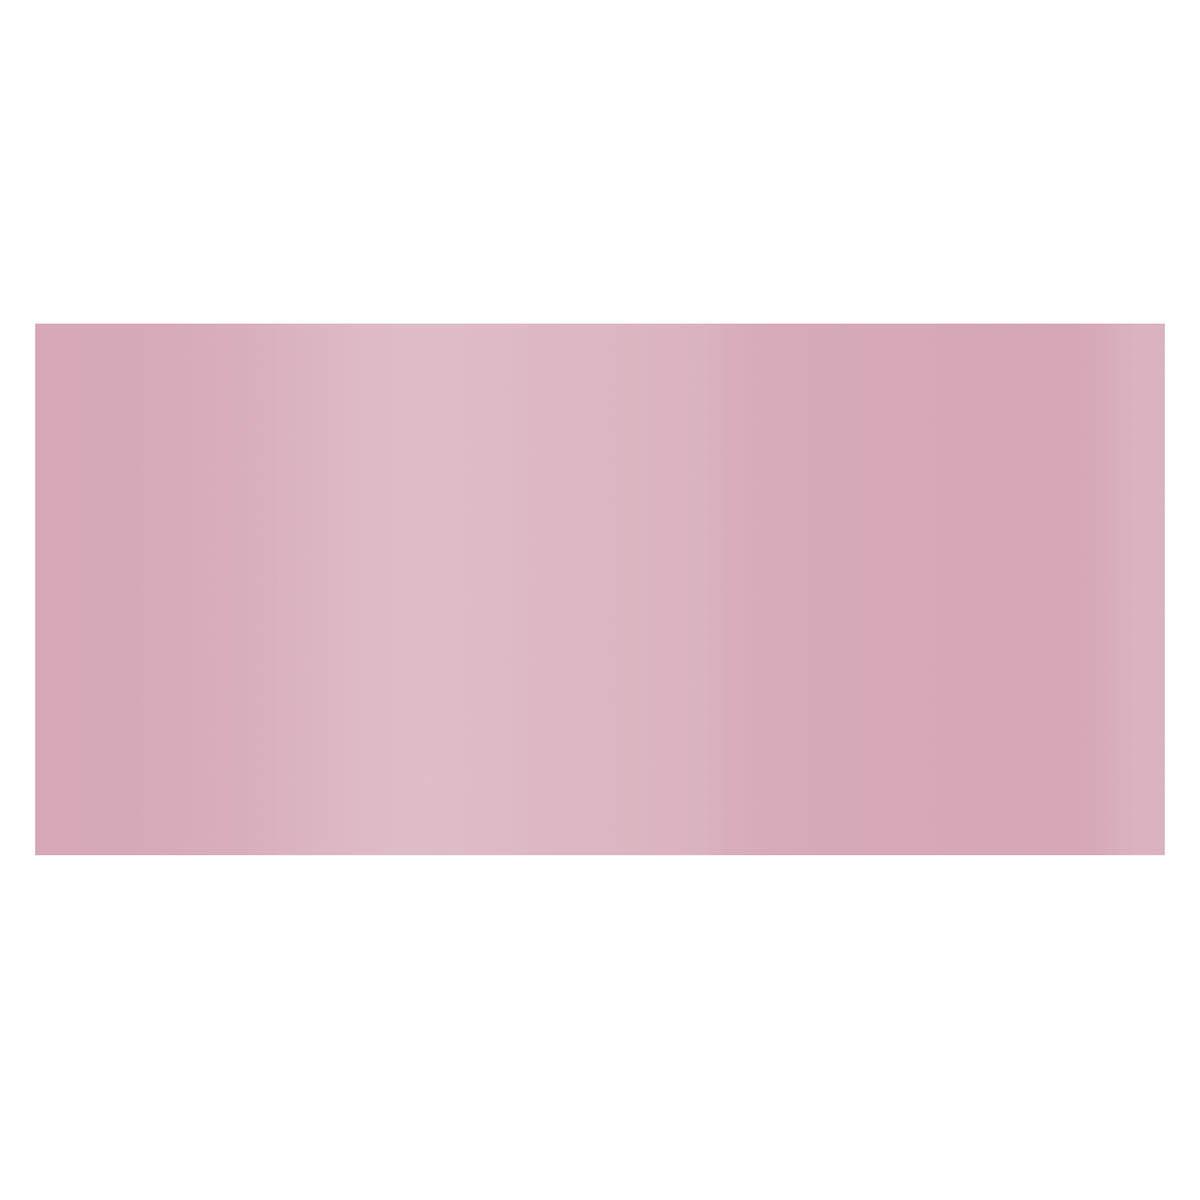 Waverly ® Inspirations Metallic Multi-Surface Acrylic Paint - Rose Quartz, 2 oz.